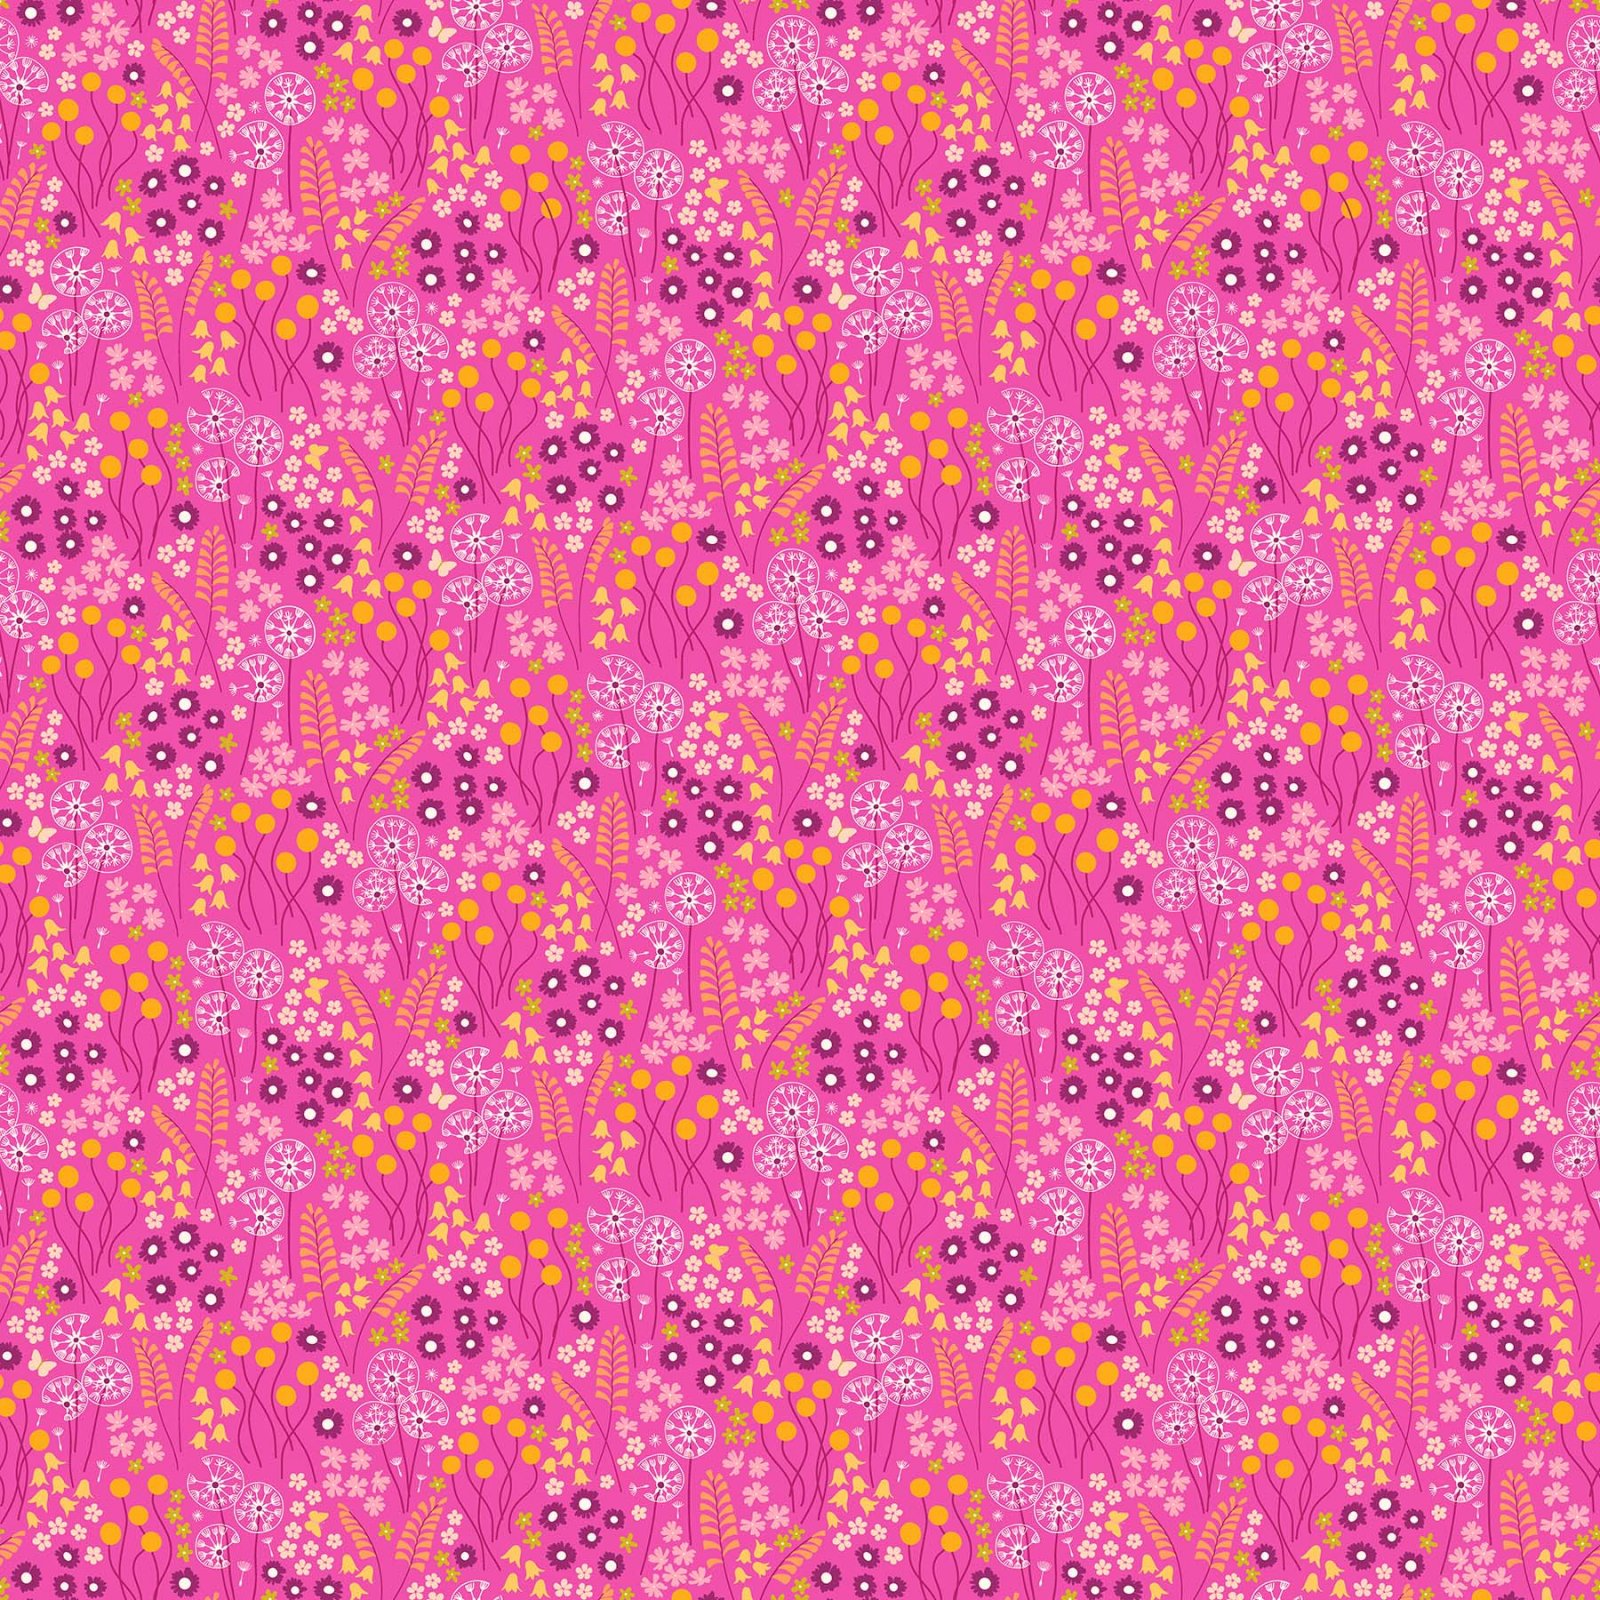 FIGO Fabrics - Mountain Meadows - Flowers on Pink - 90000-23